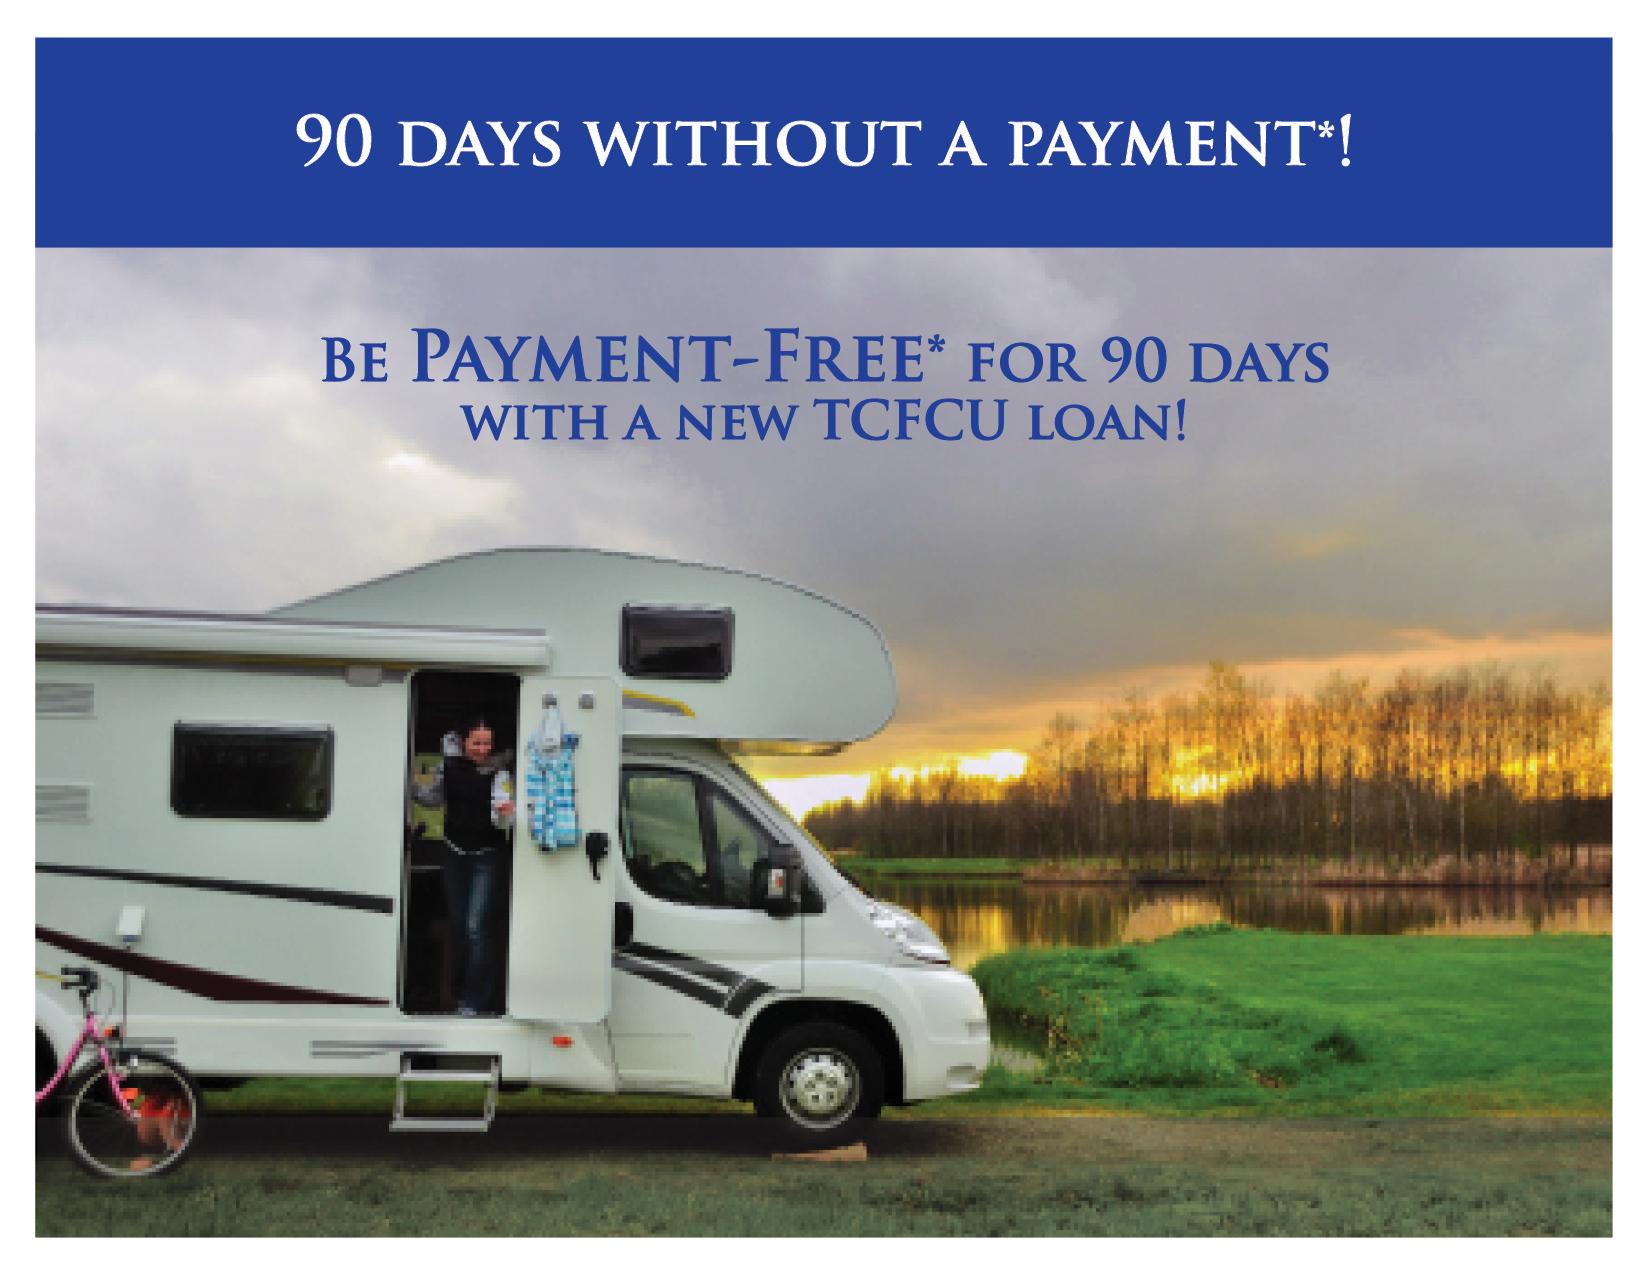 woman at camper, 90 day no pay promo